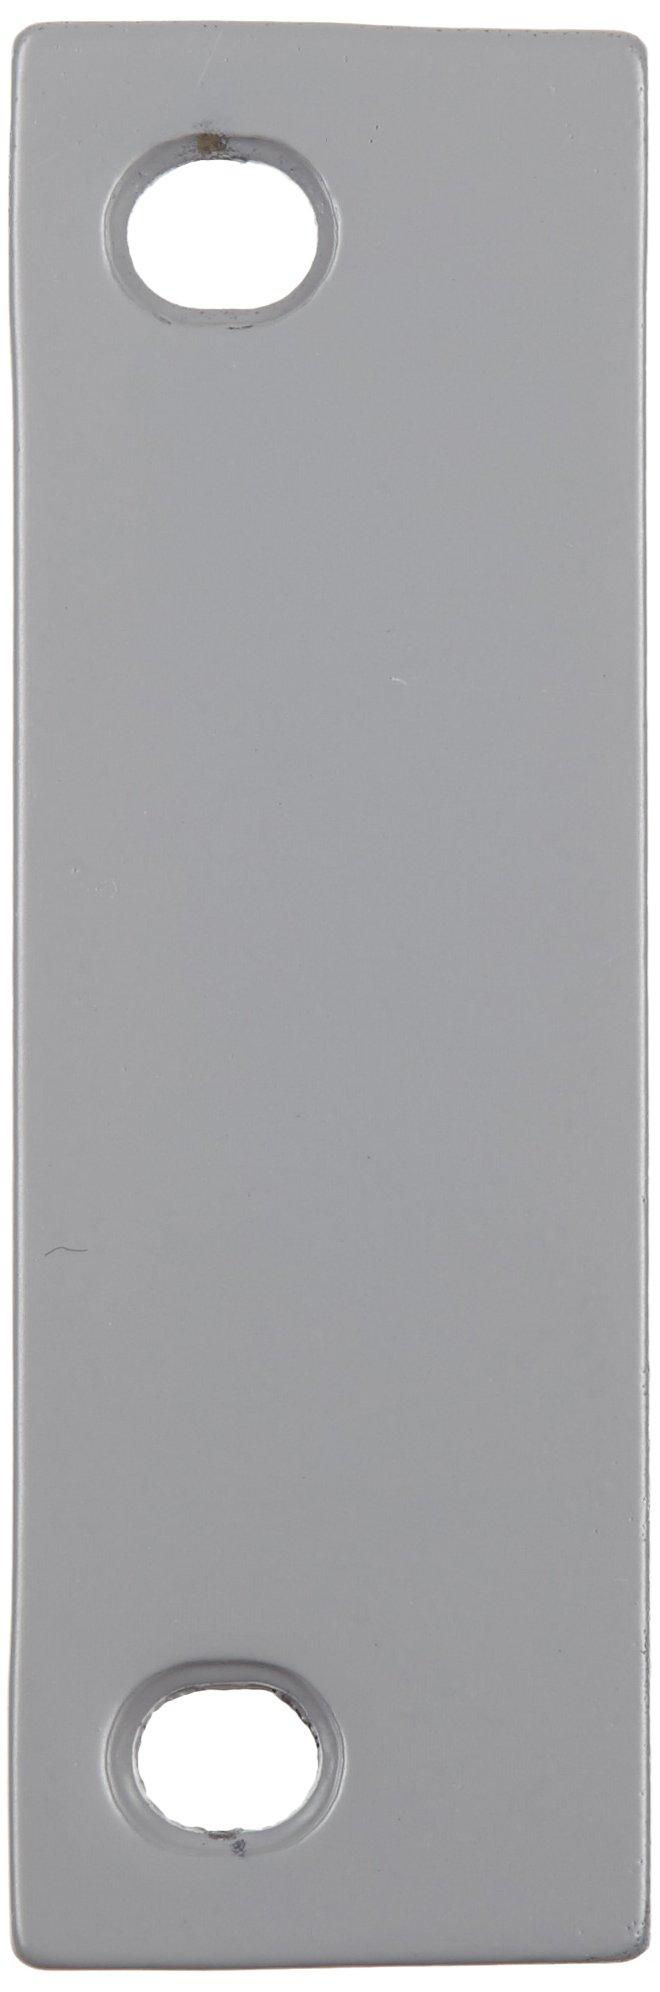 Rockwood DHF4B Steel Beveled Door Hinge Filler Plate, 1-1/2'' Width x 4-1/2'' Height, Prime Coat Finish (Pack of 25)